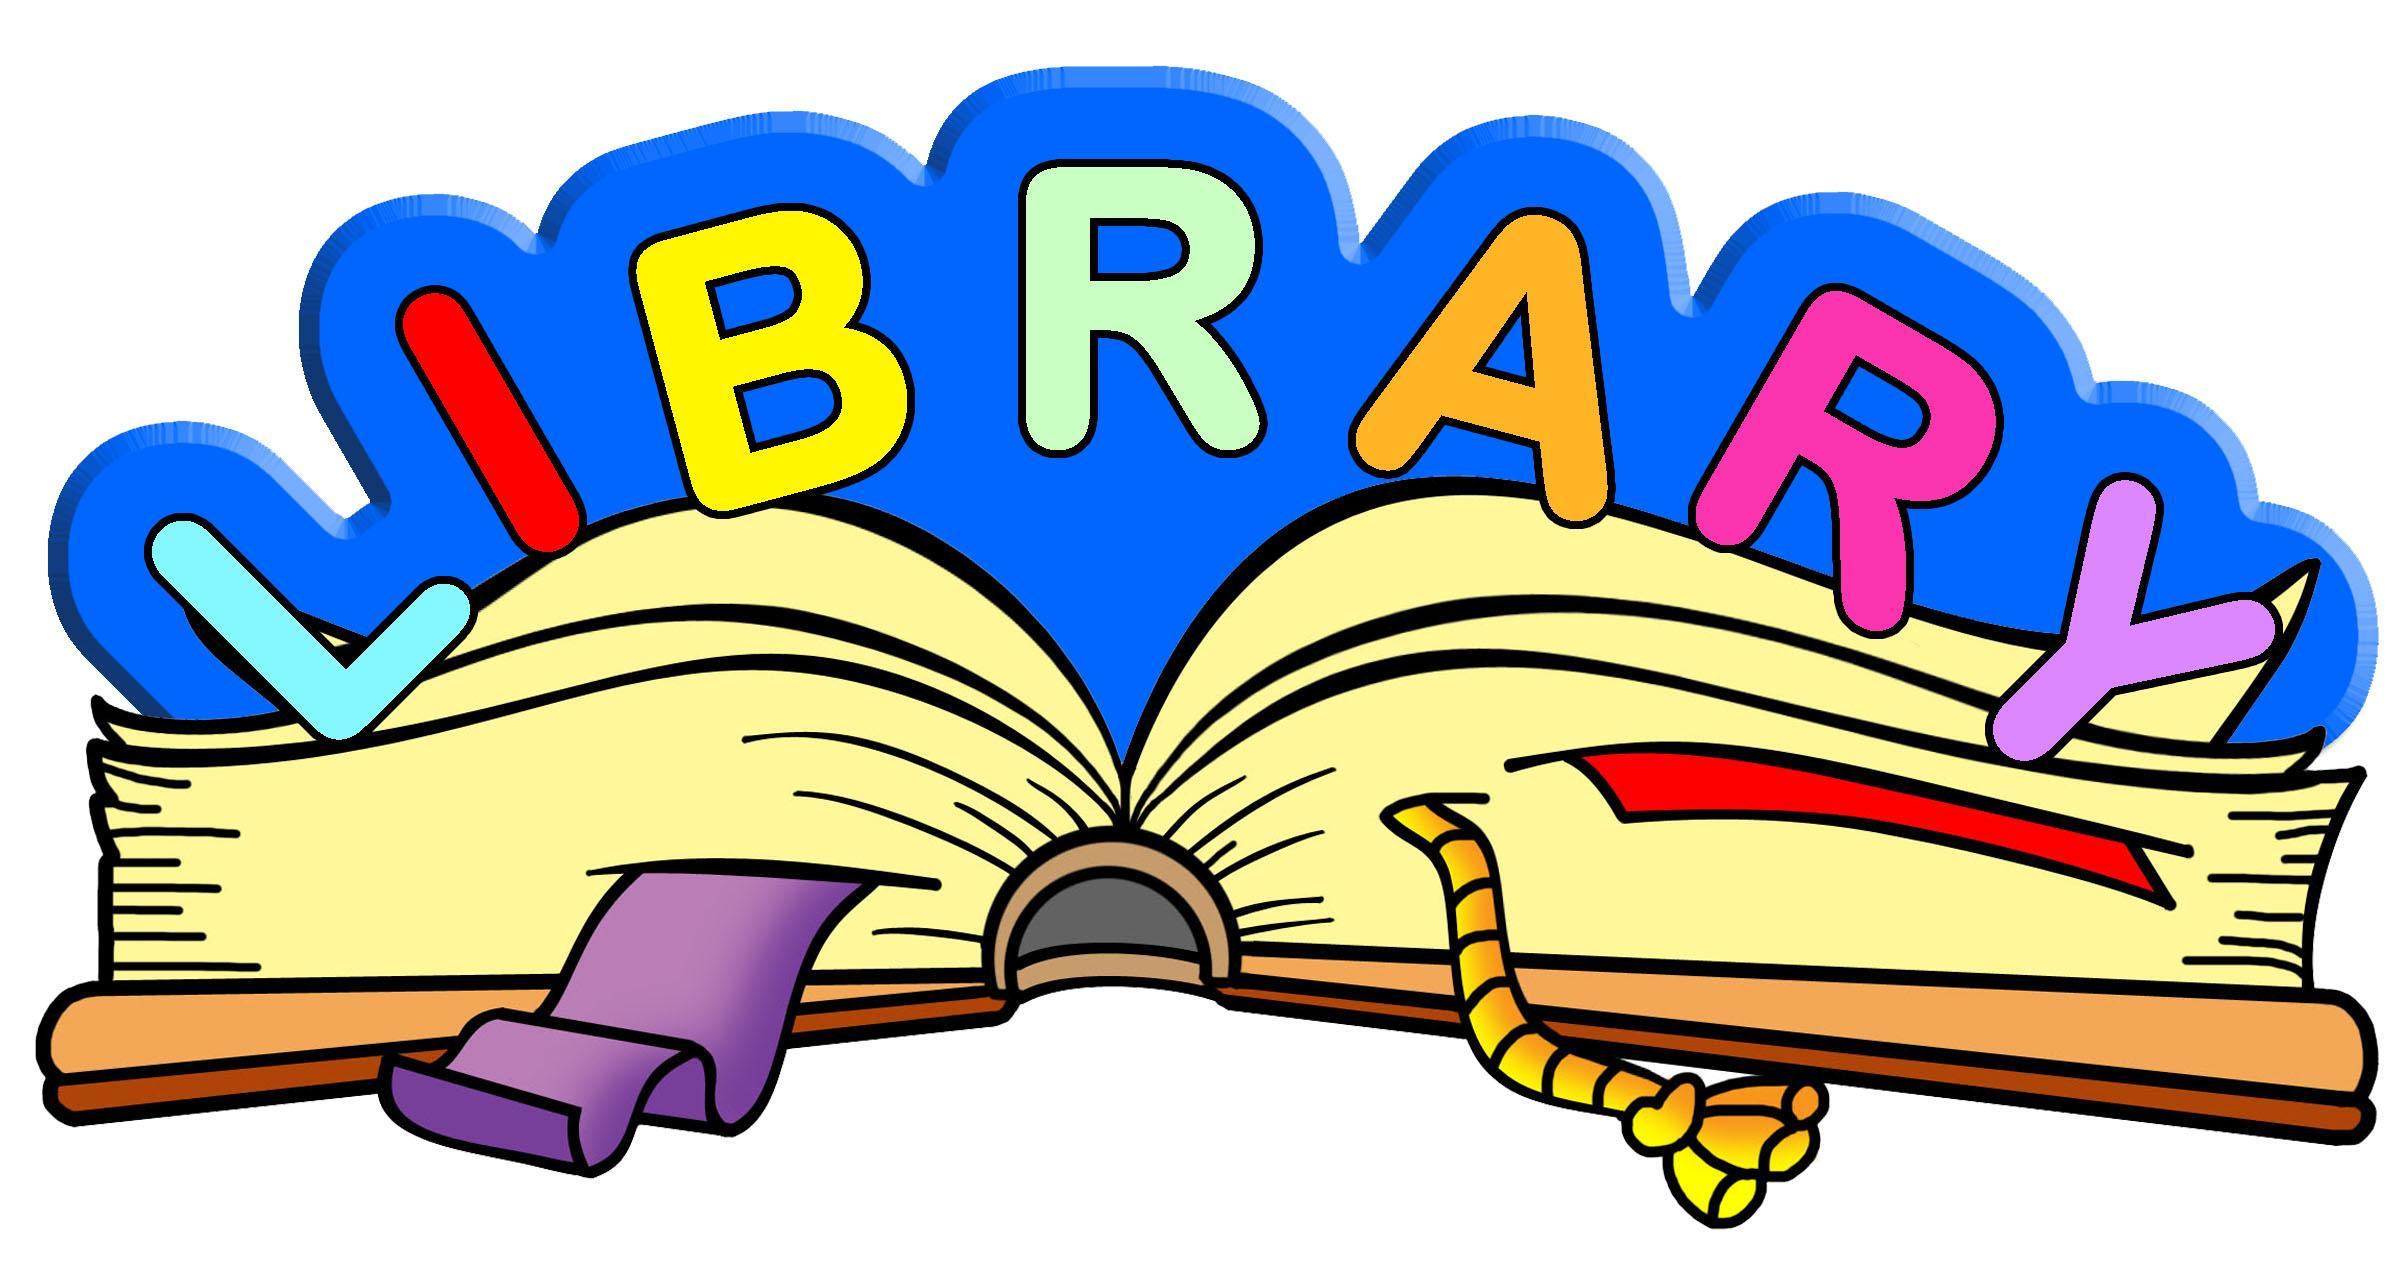 Elementary school jokingart com. Library clipart